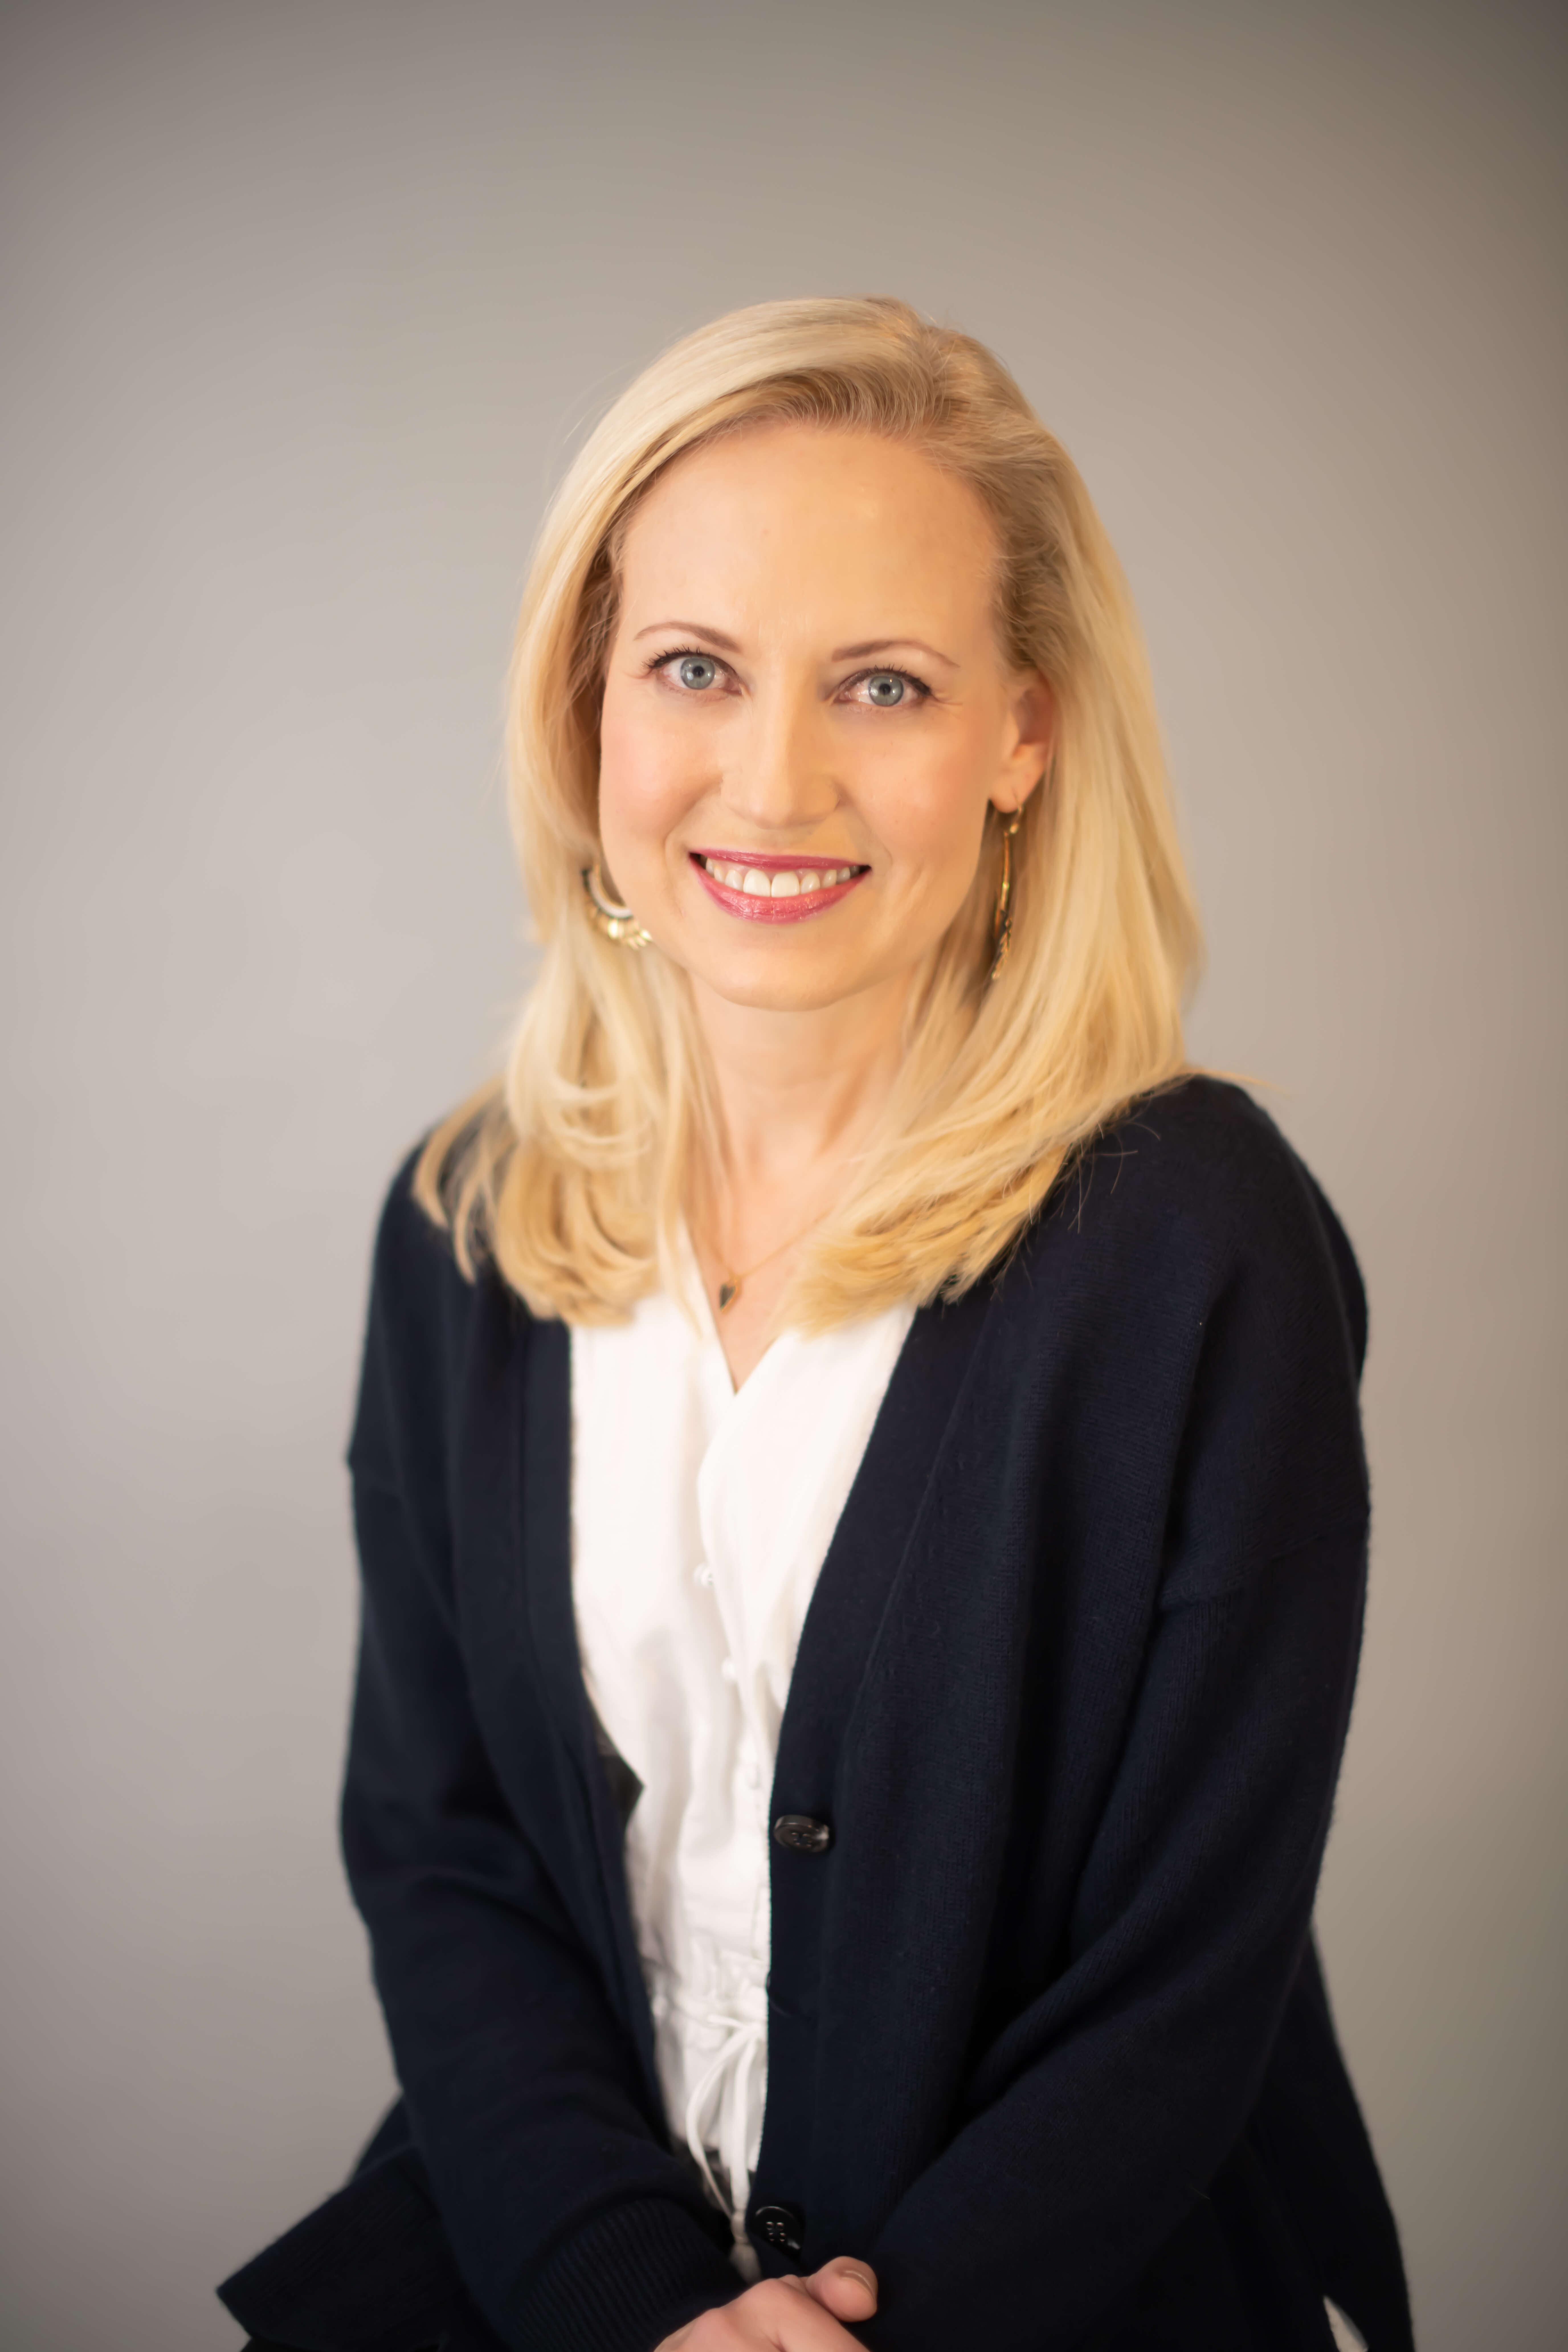 Christina Schlegel